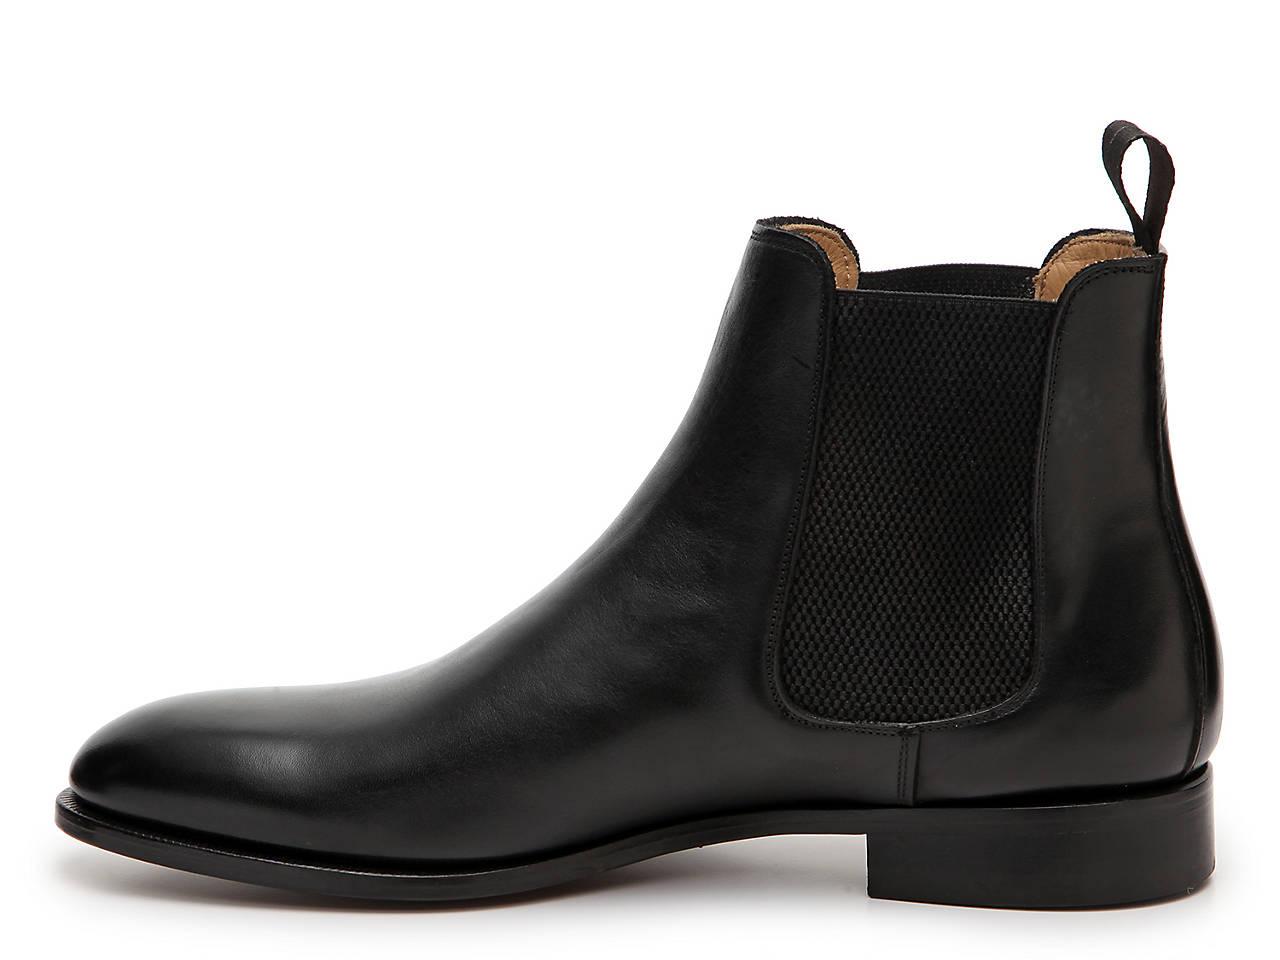 ebab38555d0 Coach and Four Bellini Boot Men s Shoes